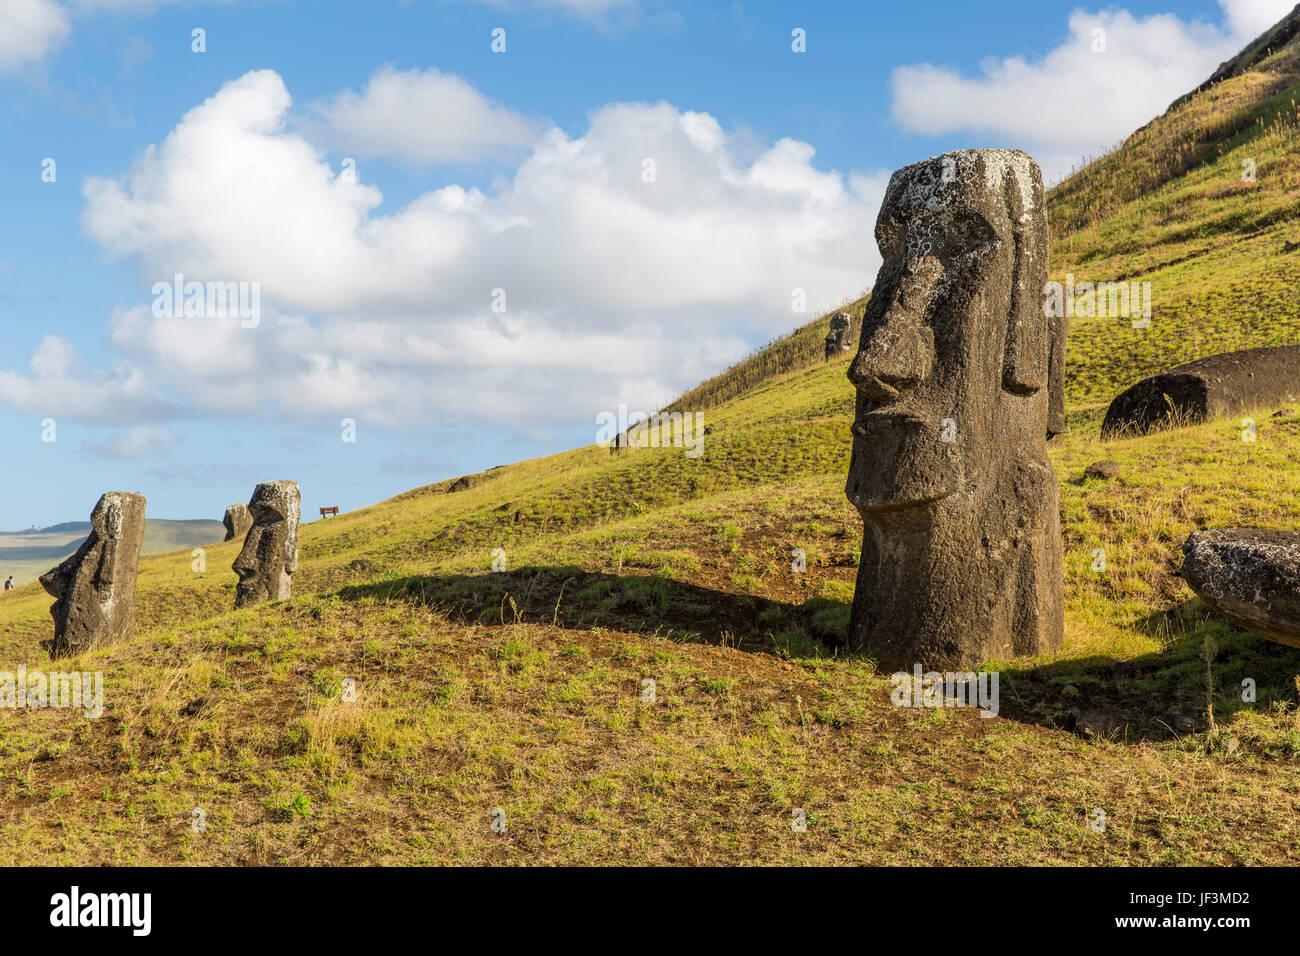 Moai statue at Rano Raraku, Easter Island, Chile - Stock Image